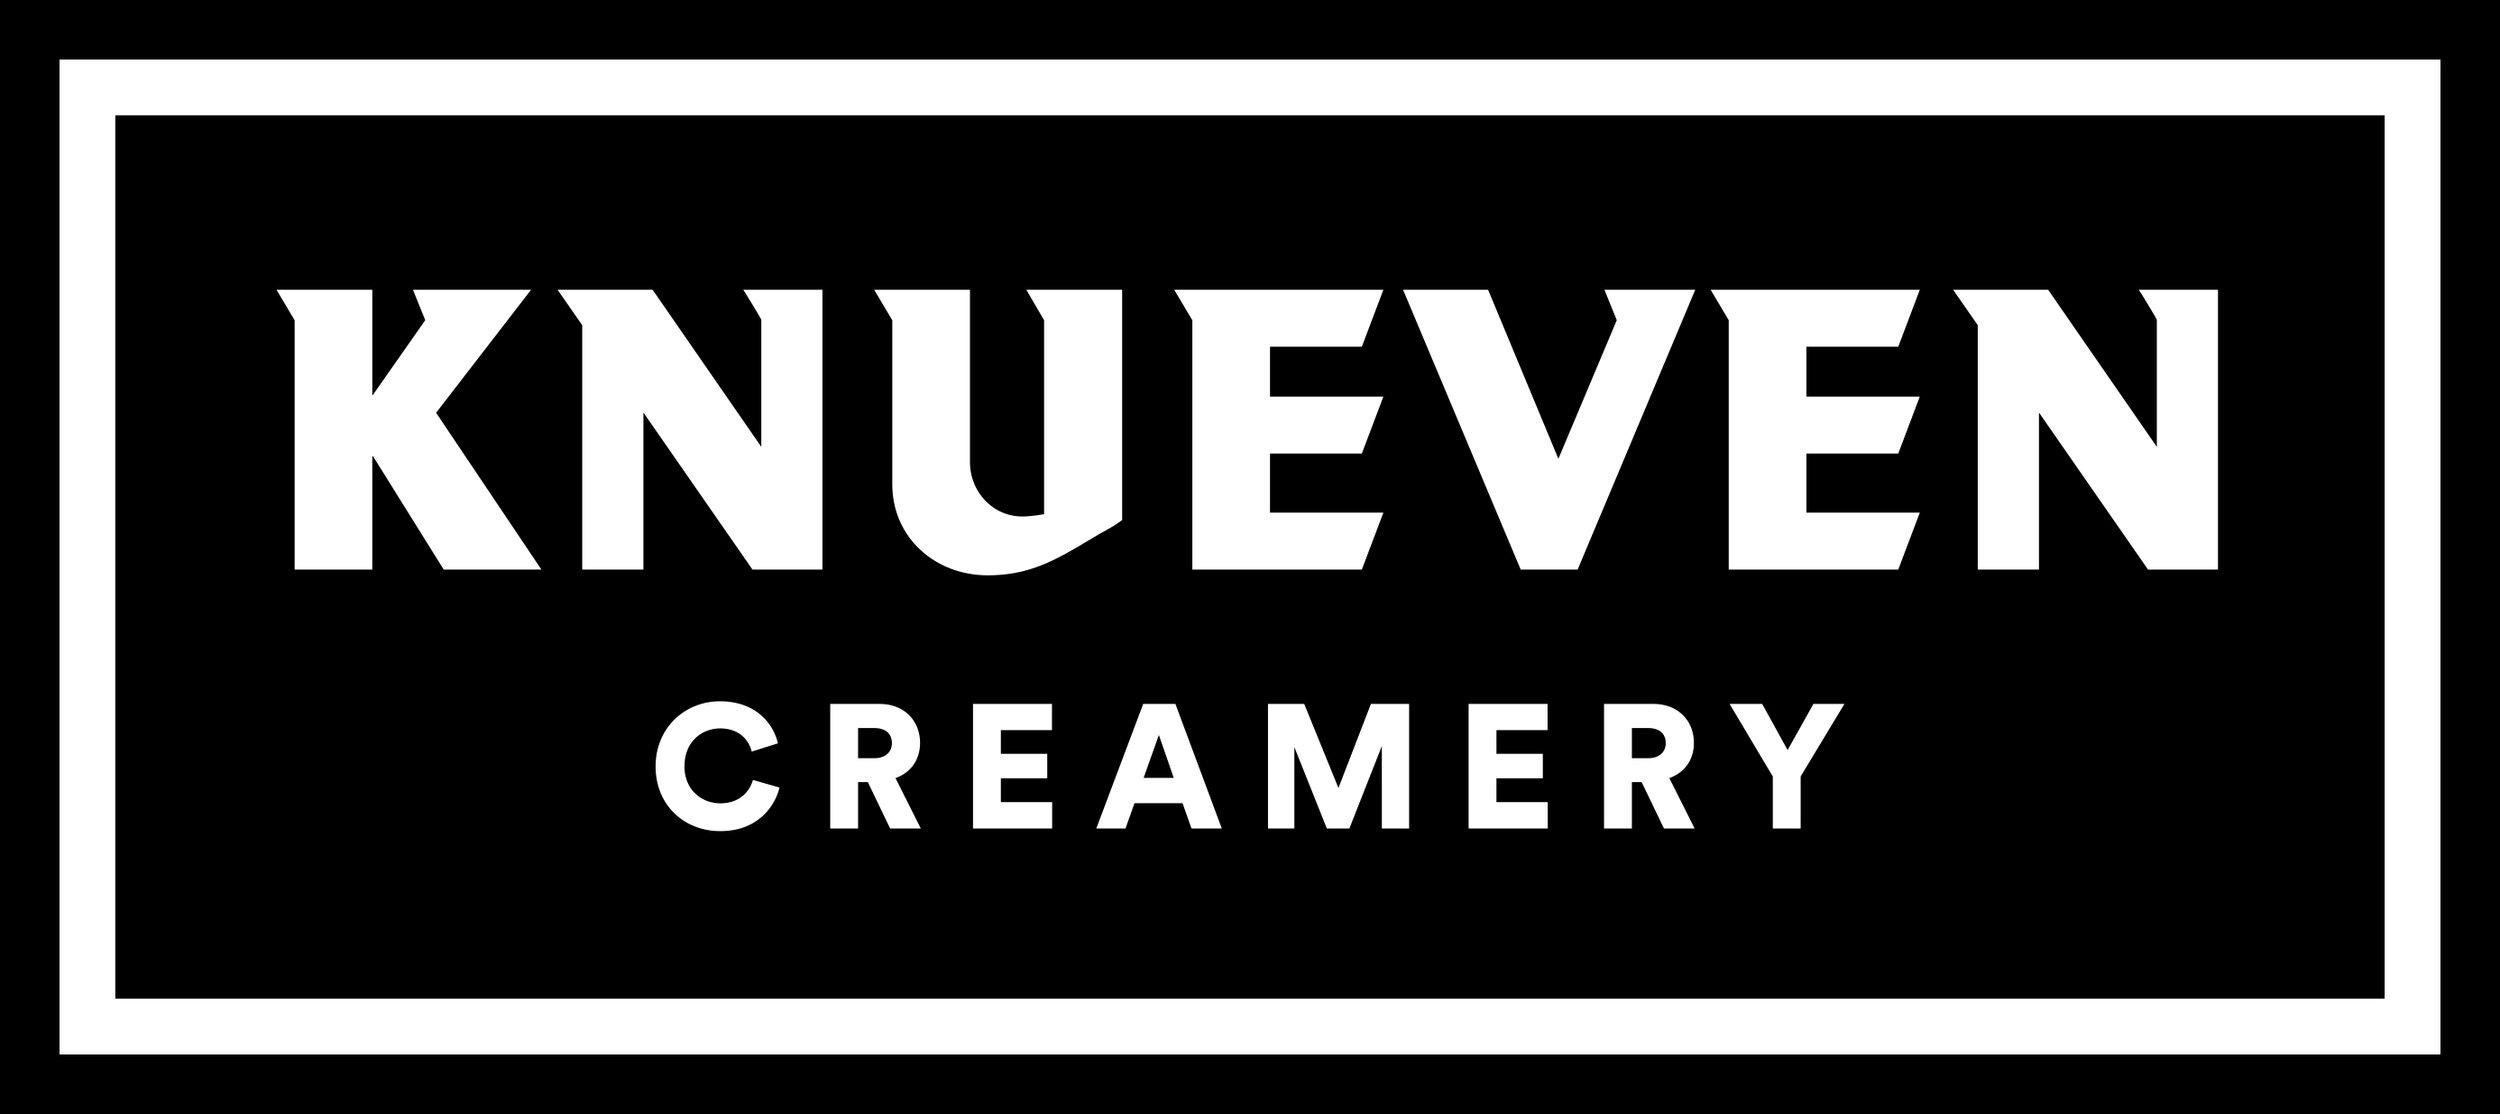 creamery.jpg